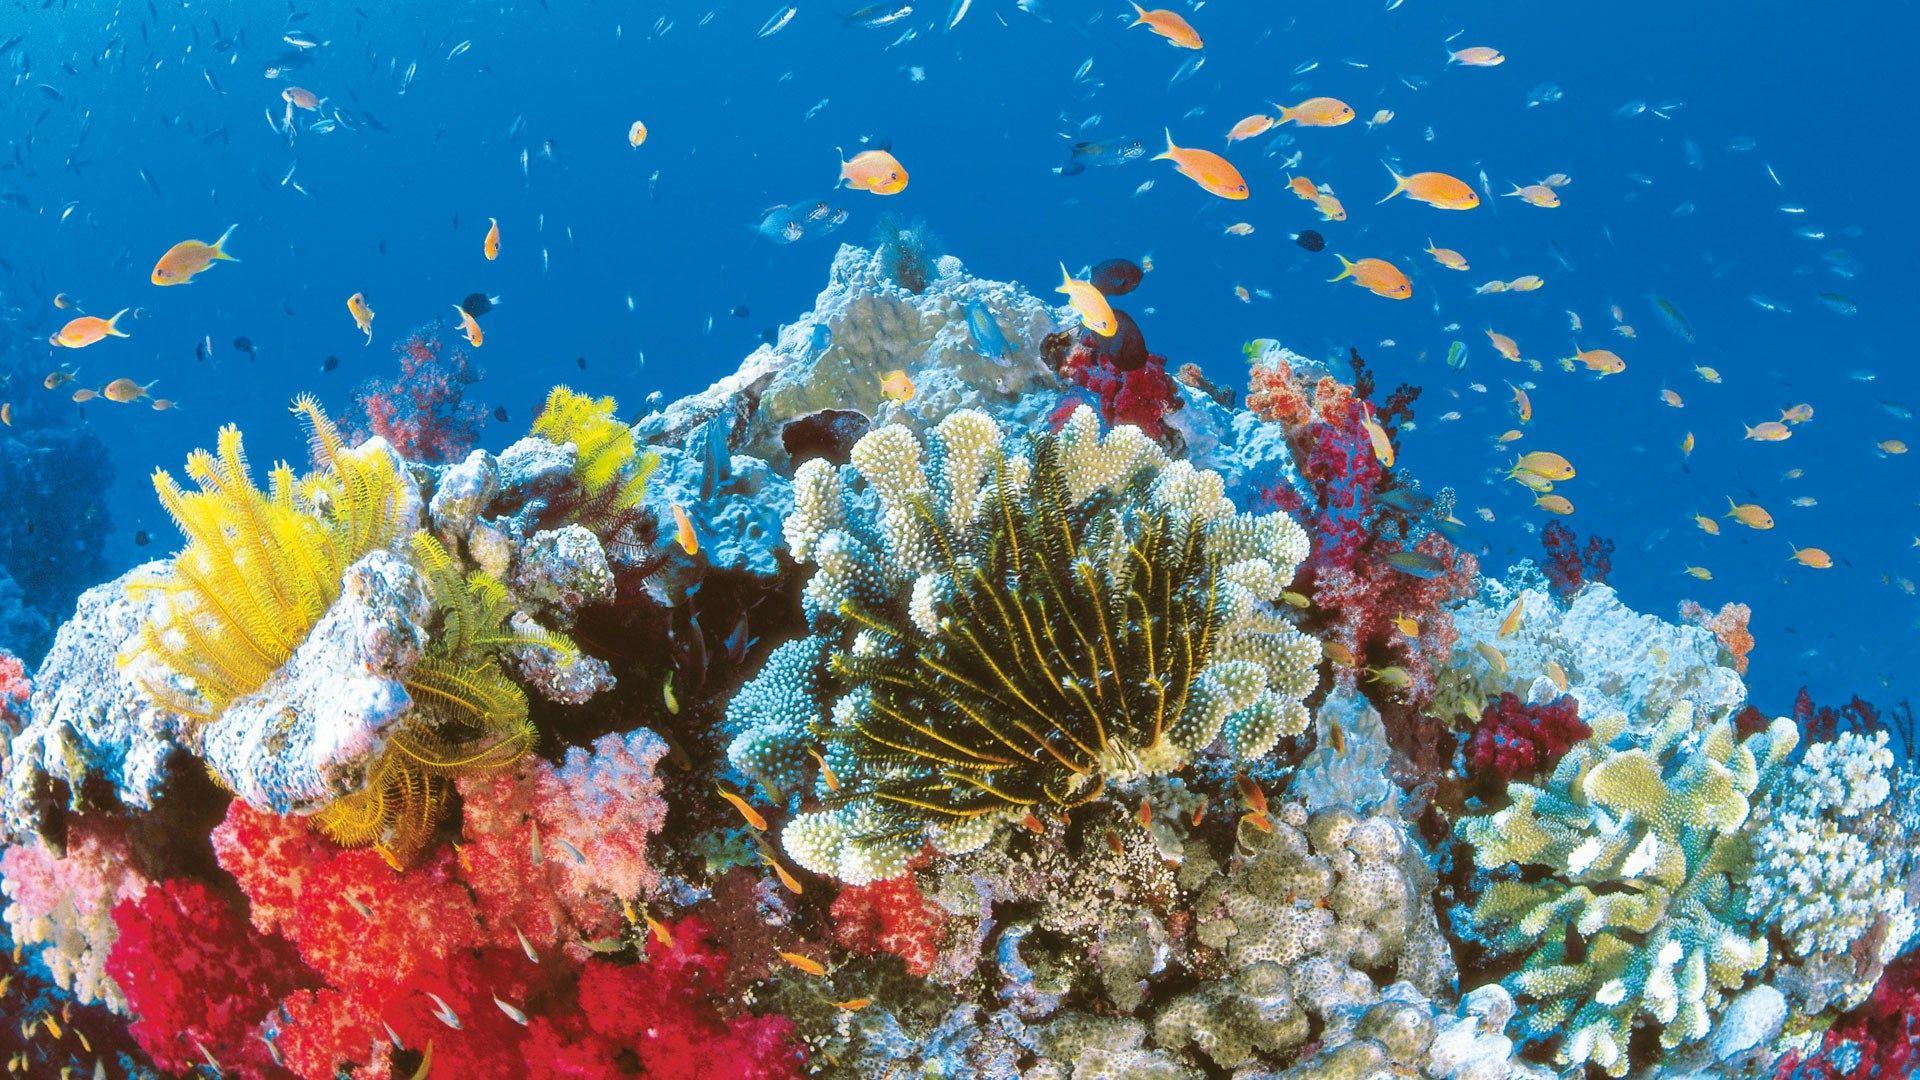 free high resolution wallpaper great barrier reef, 598 kb - rider